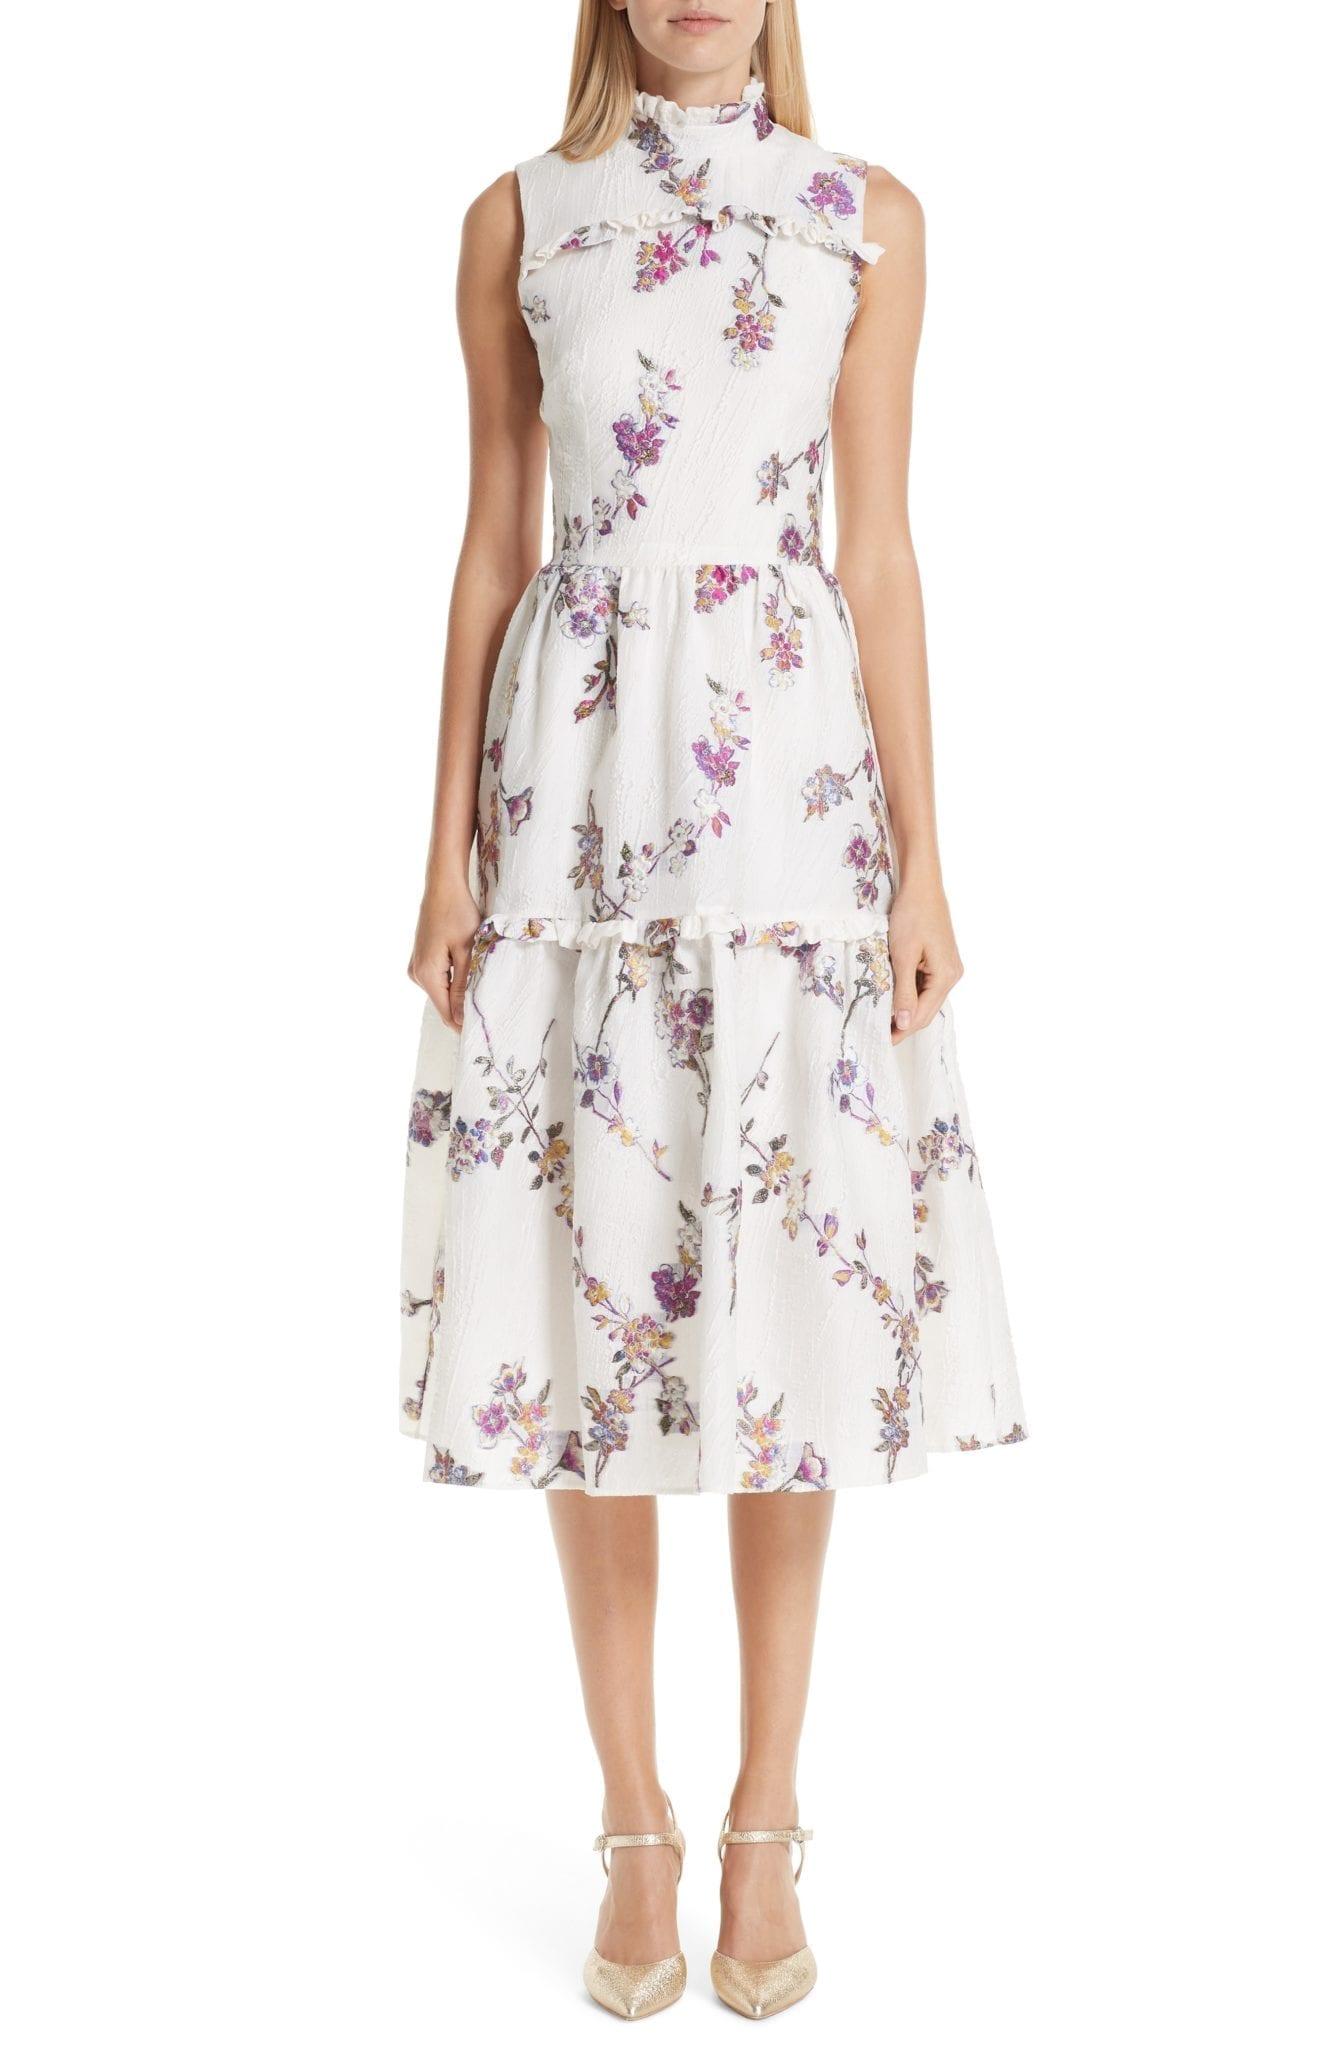 MALENE ODDERSHEDE BACH Jacquard Midi White / Floral Printed Dress